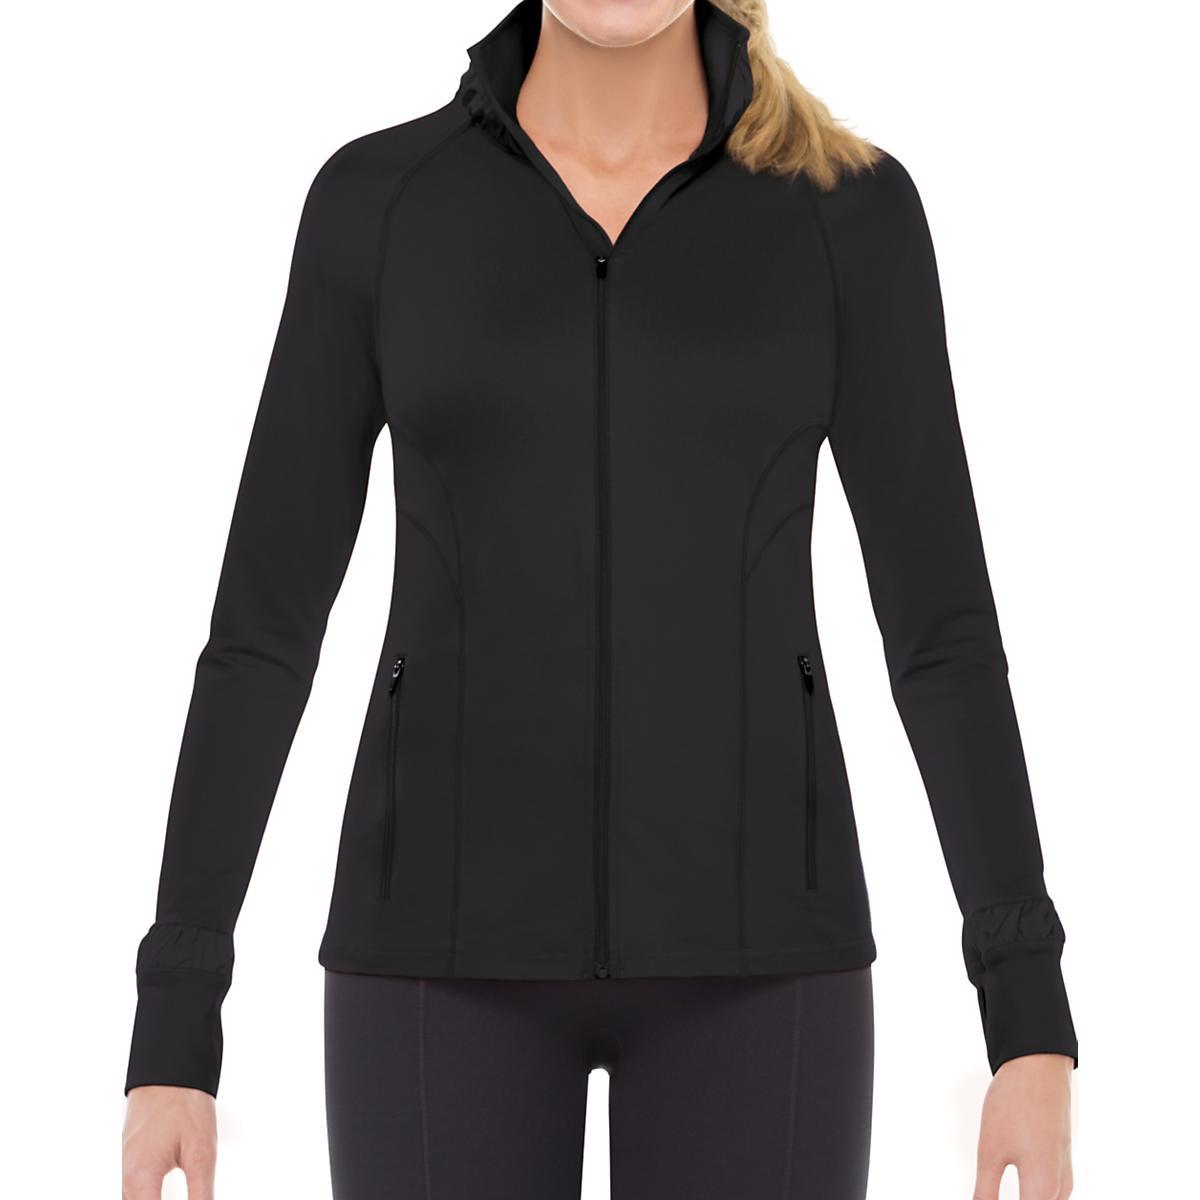 Women's Spanx�Contour Jacket